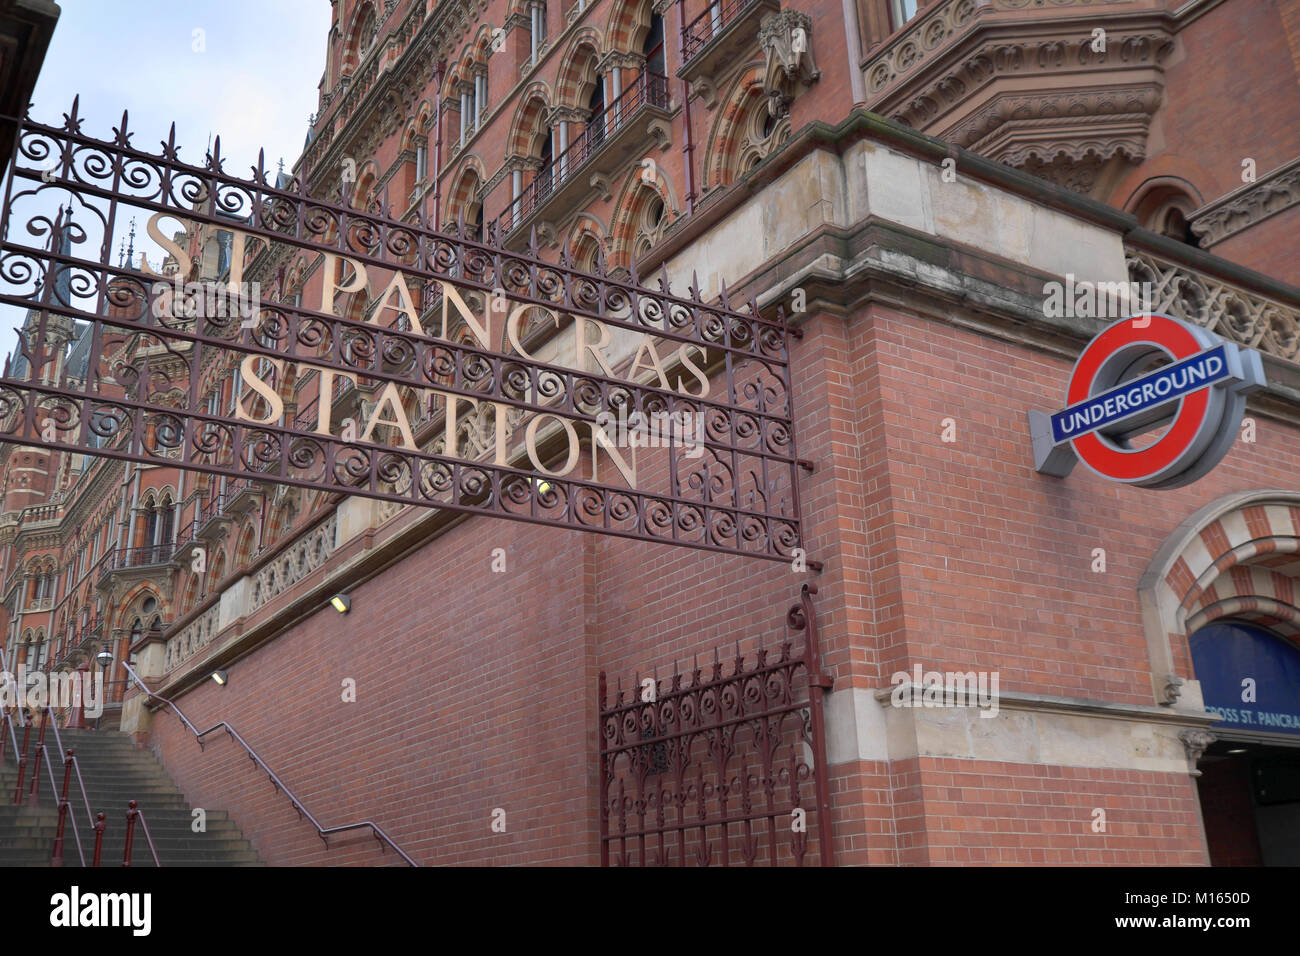 st pancras international railway station london - Stock Image